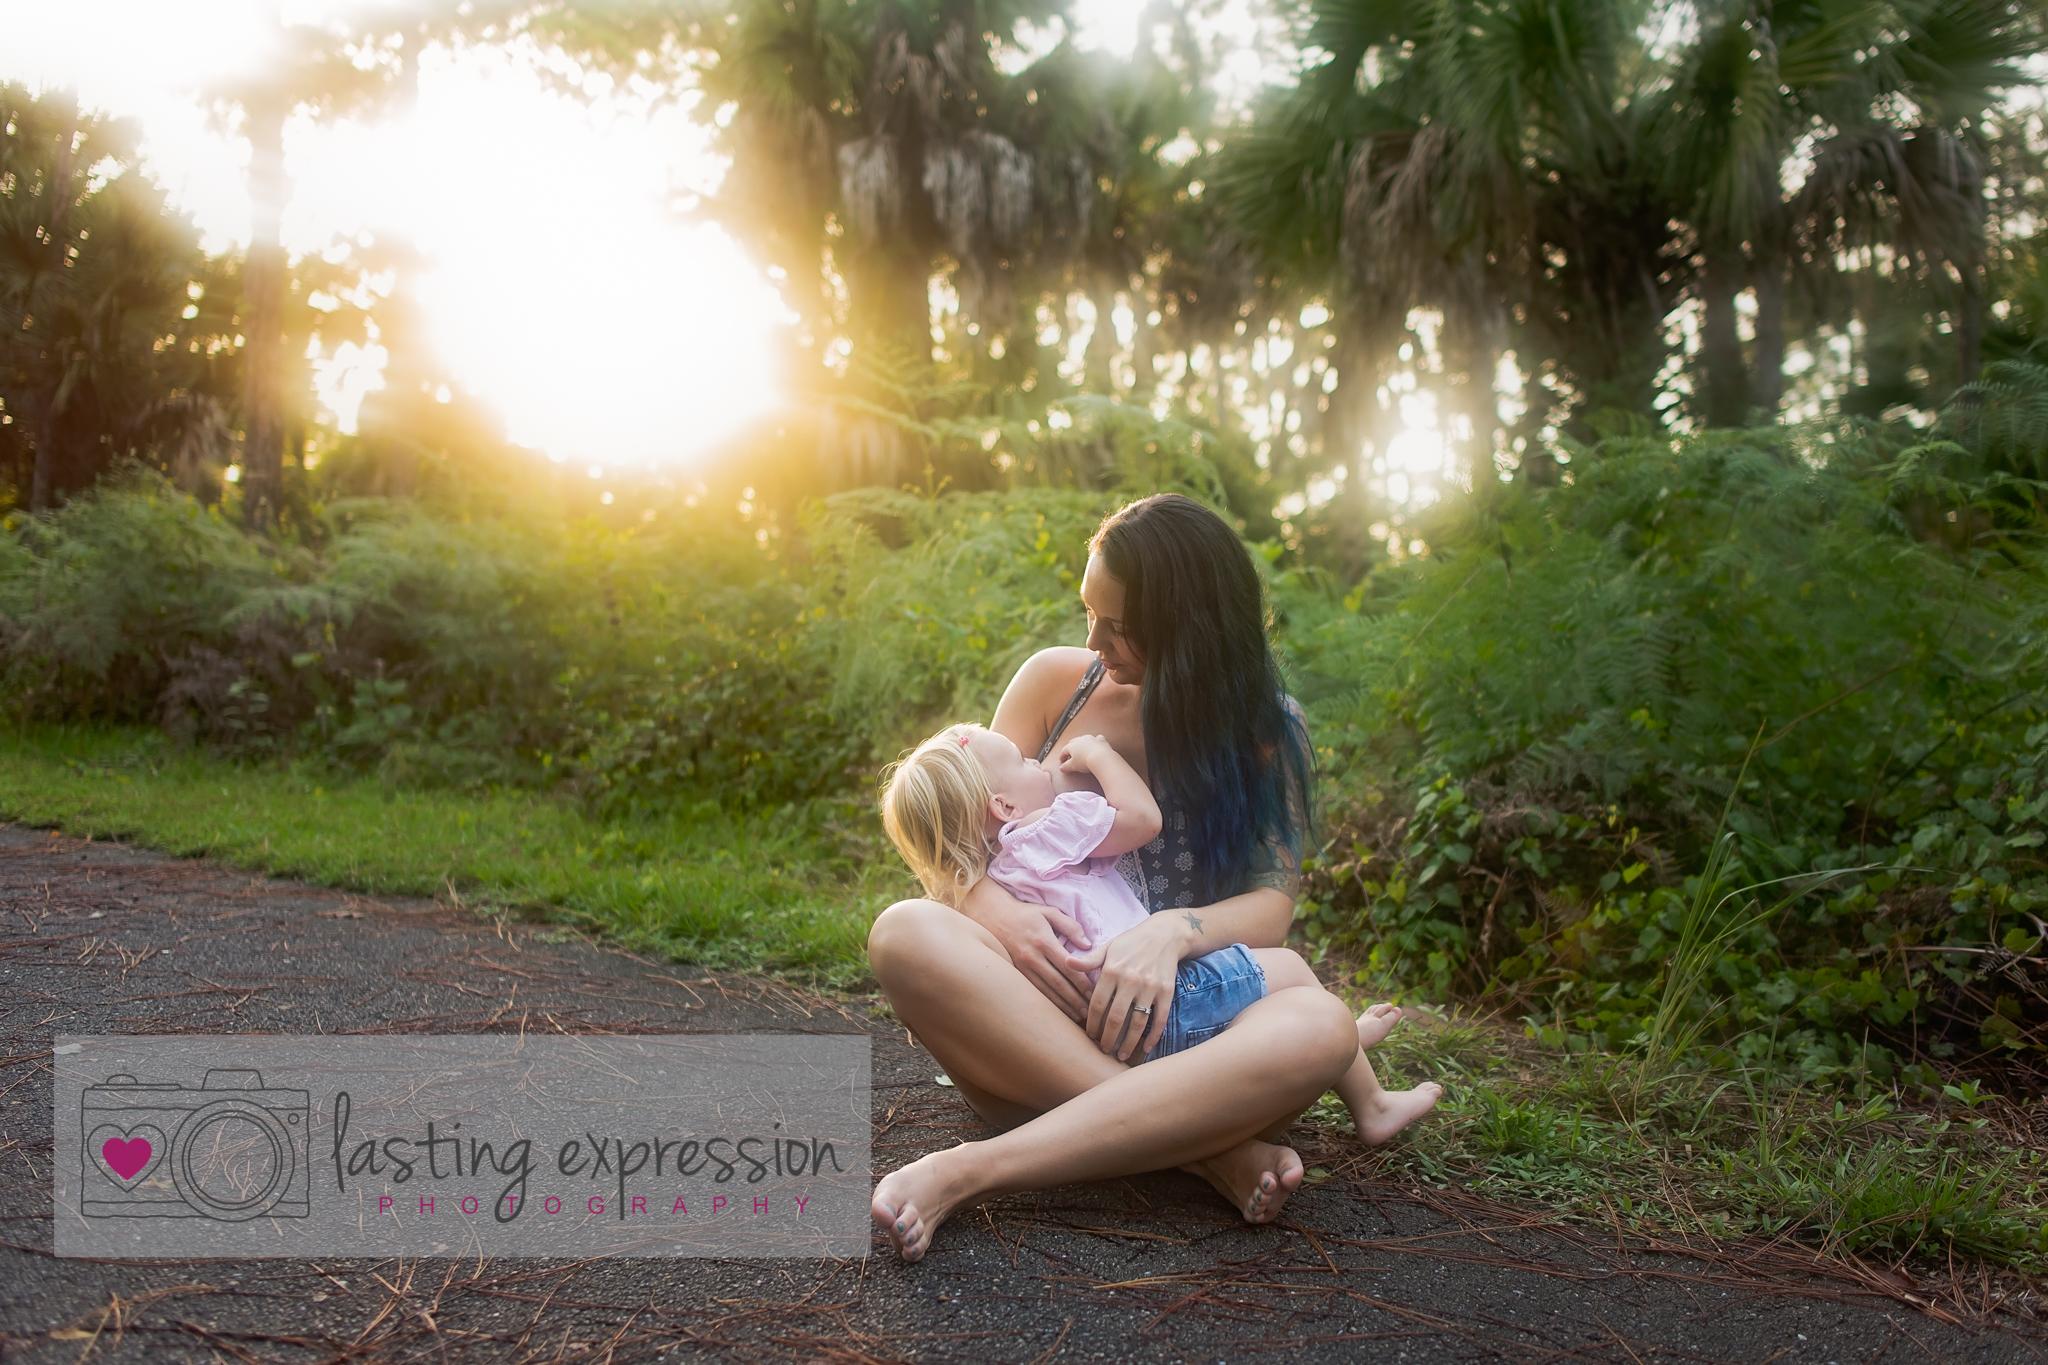 breastfeeding-logo-4.jpg